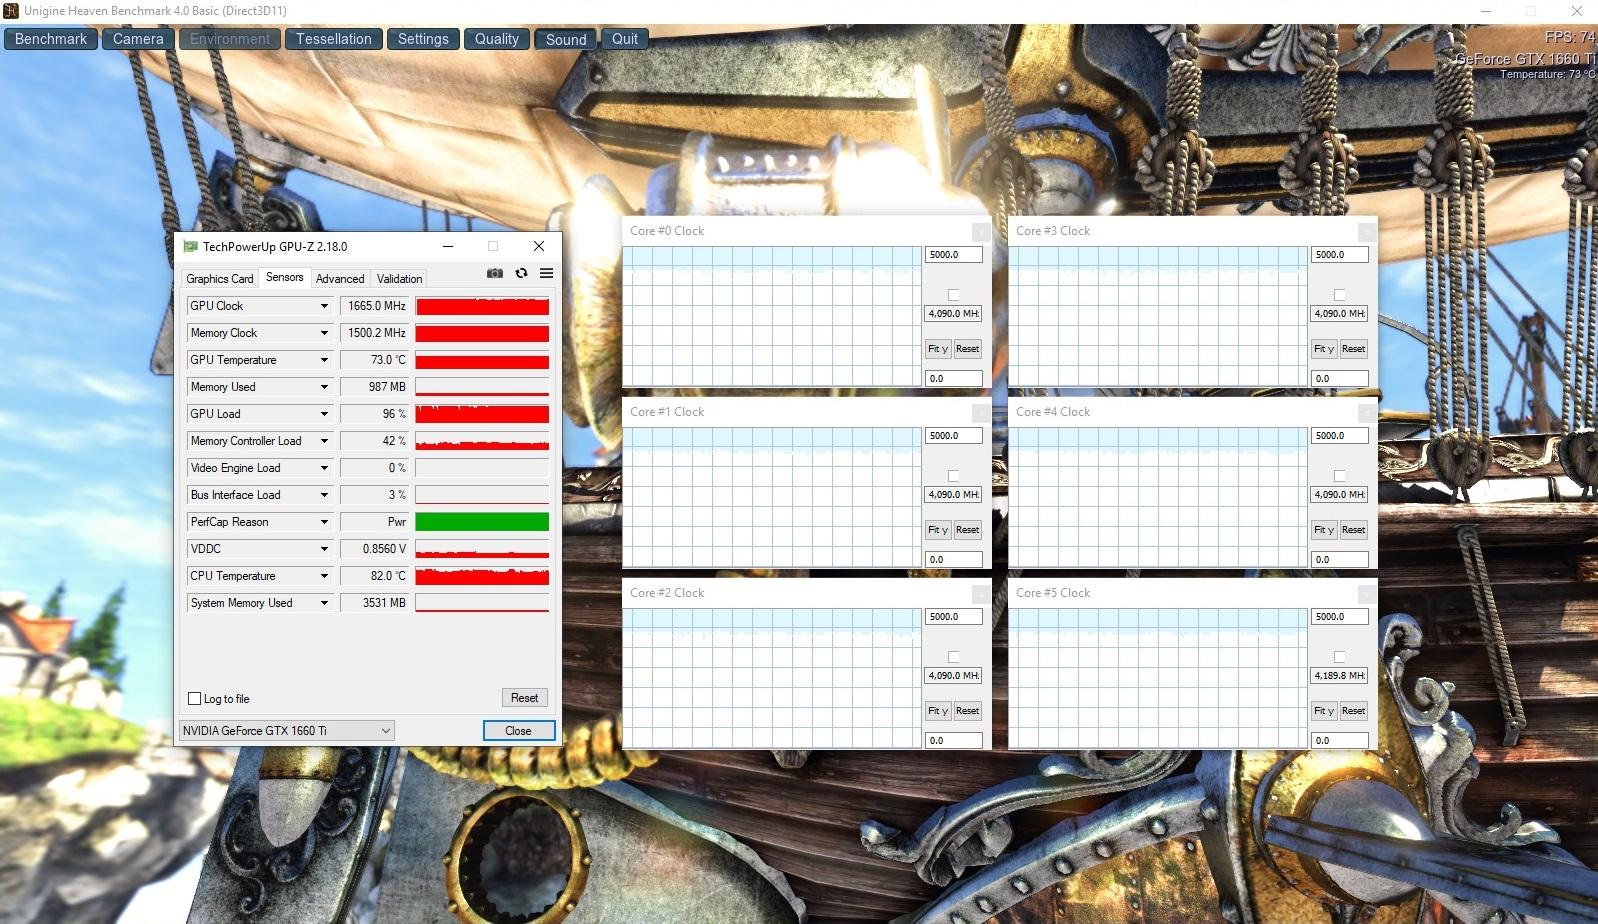 NVIDIA GeForce GTX 1660 Ti Laptop GPU Review - NotebookCheck